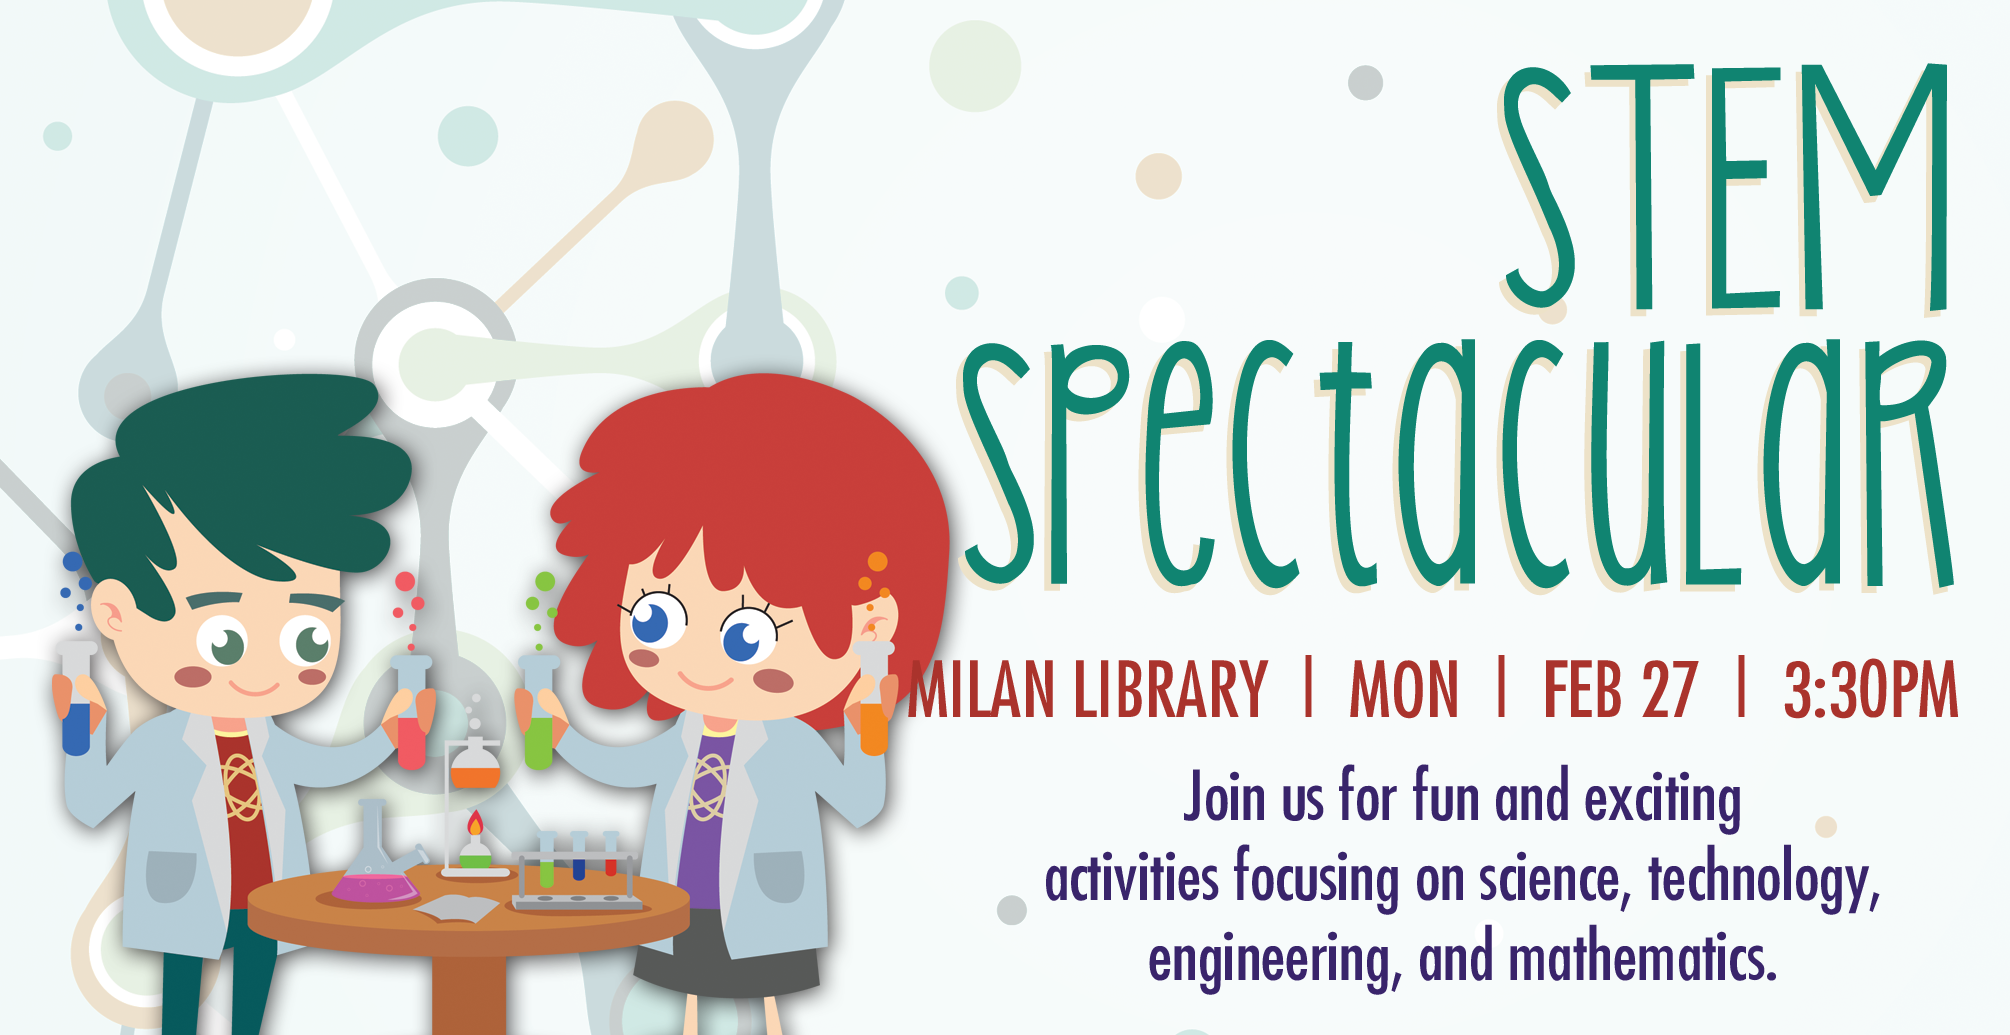 2017-02-CHILDREN-Milan-Stem-Spectacular-Slide